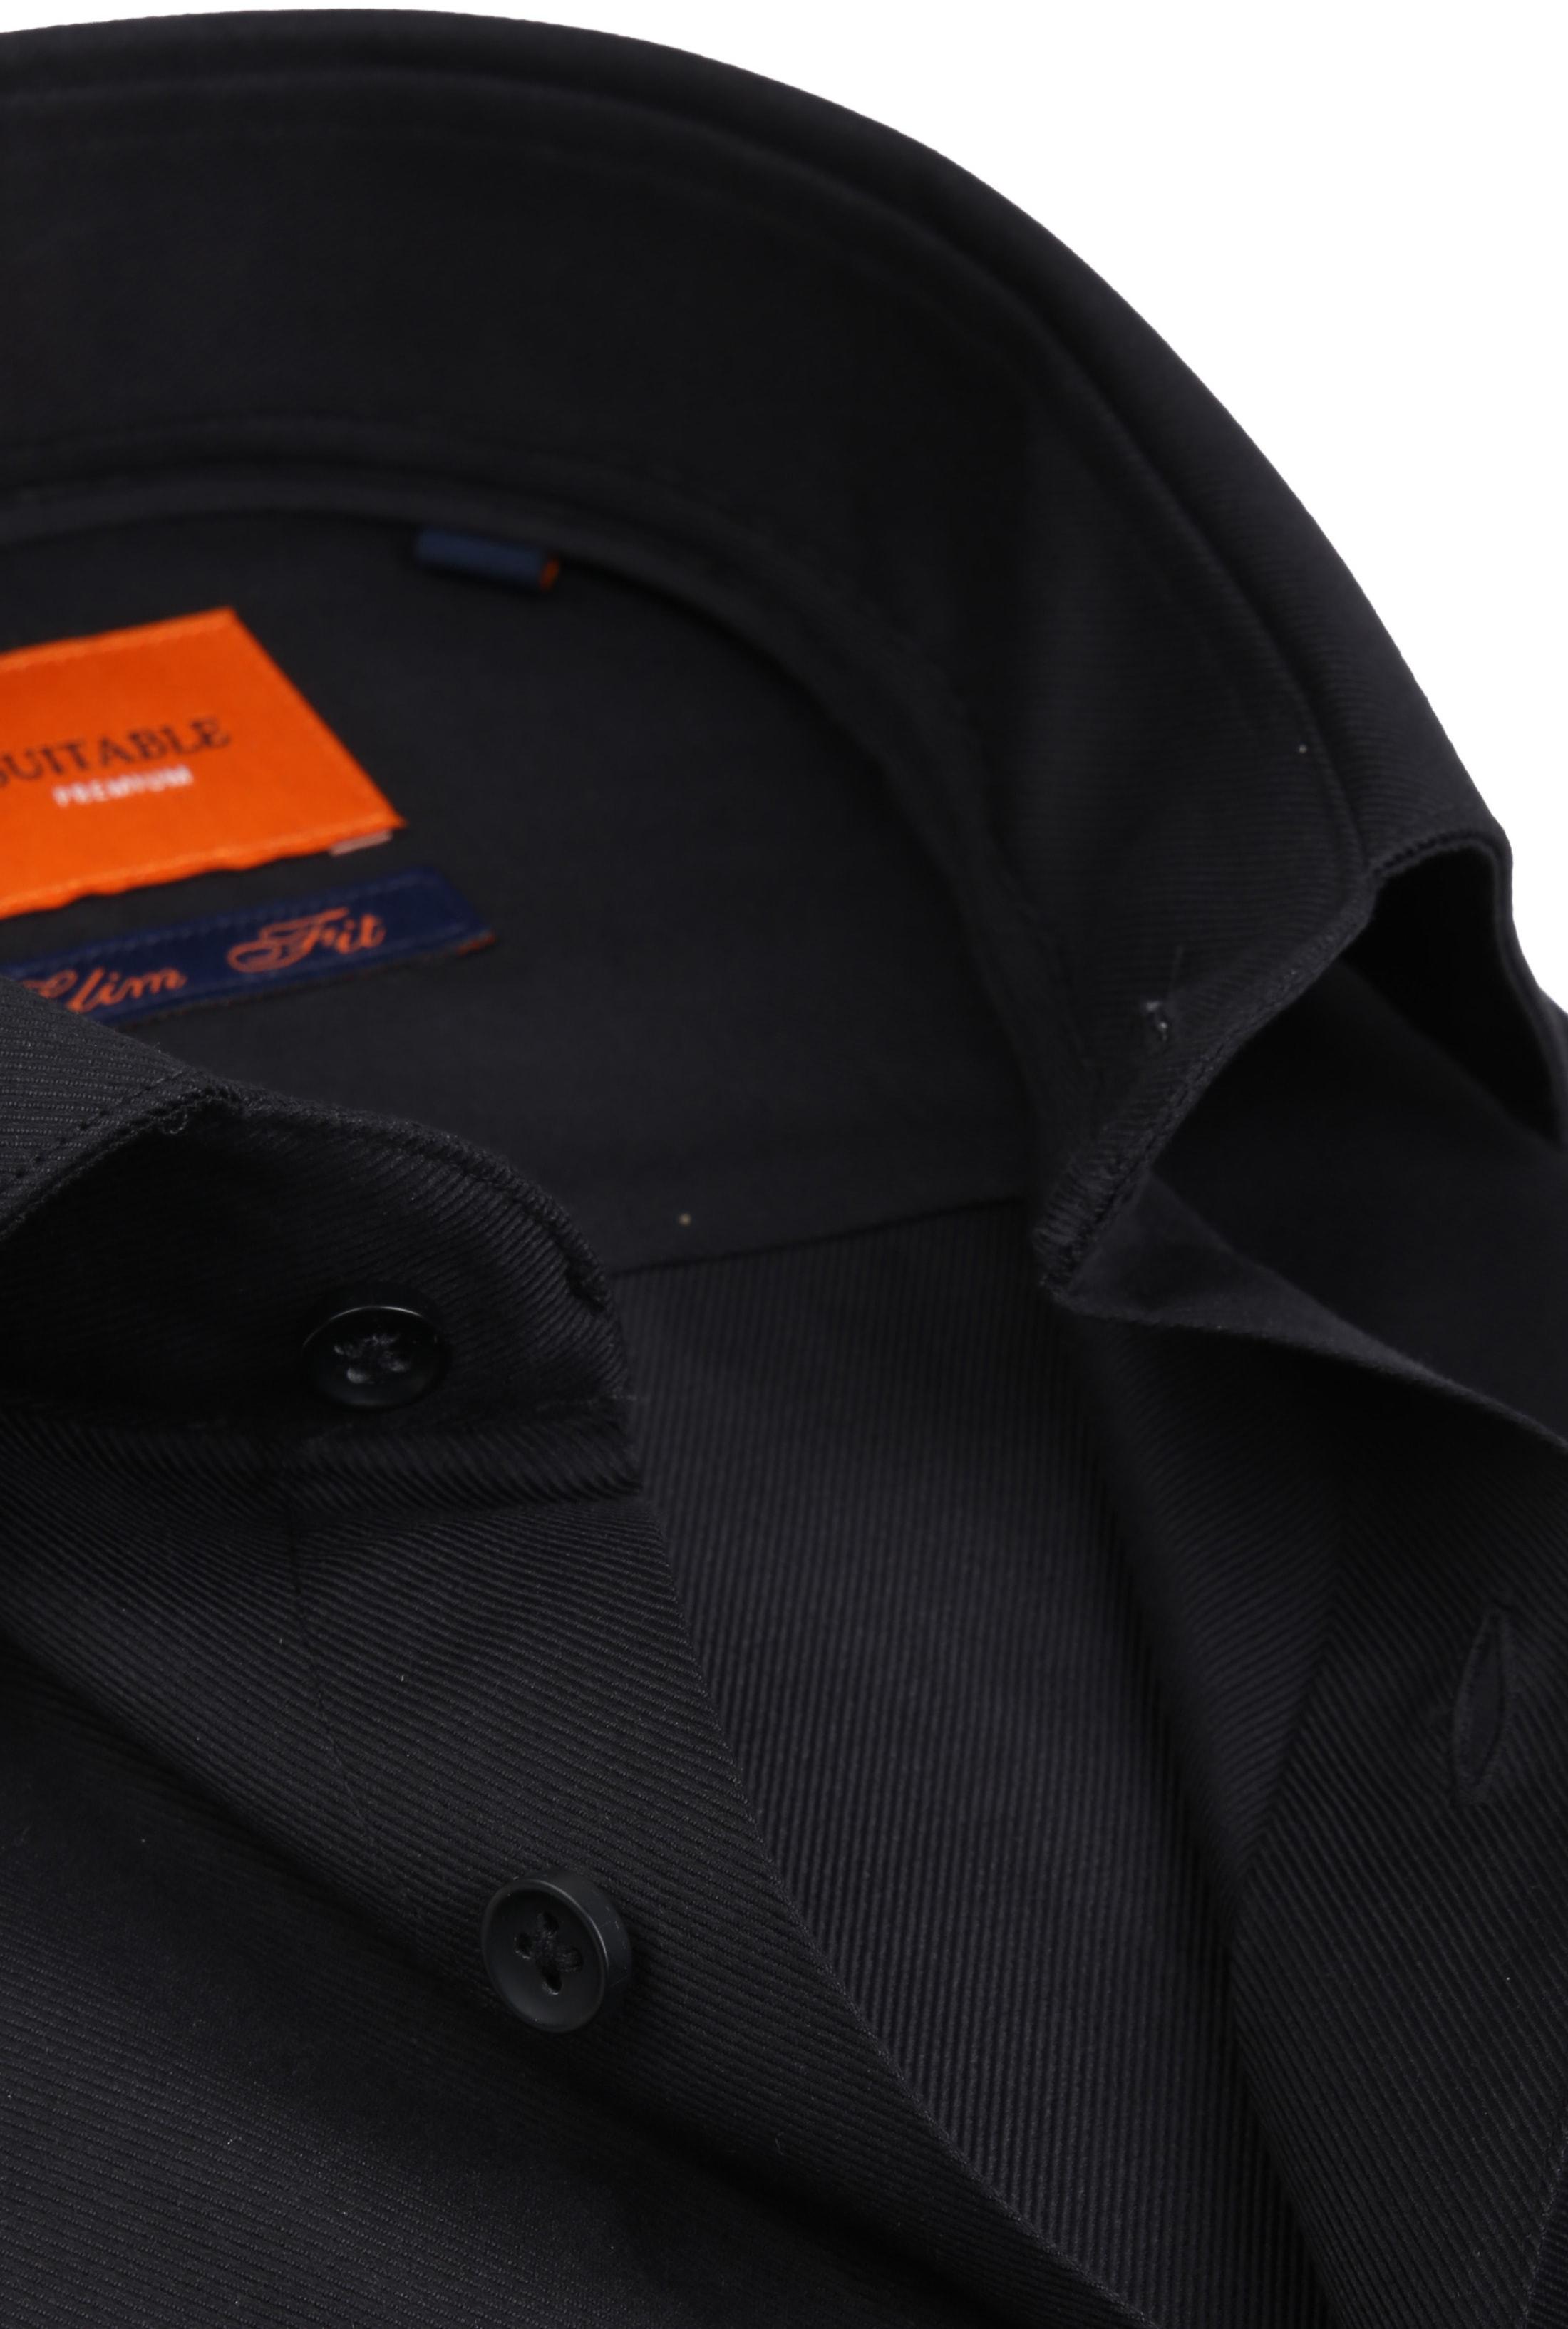 Suitable Shirt Black Pepita foto 1